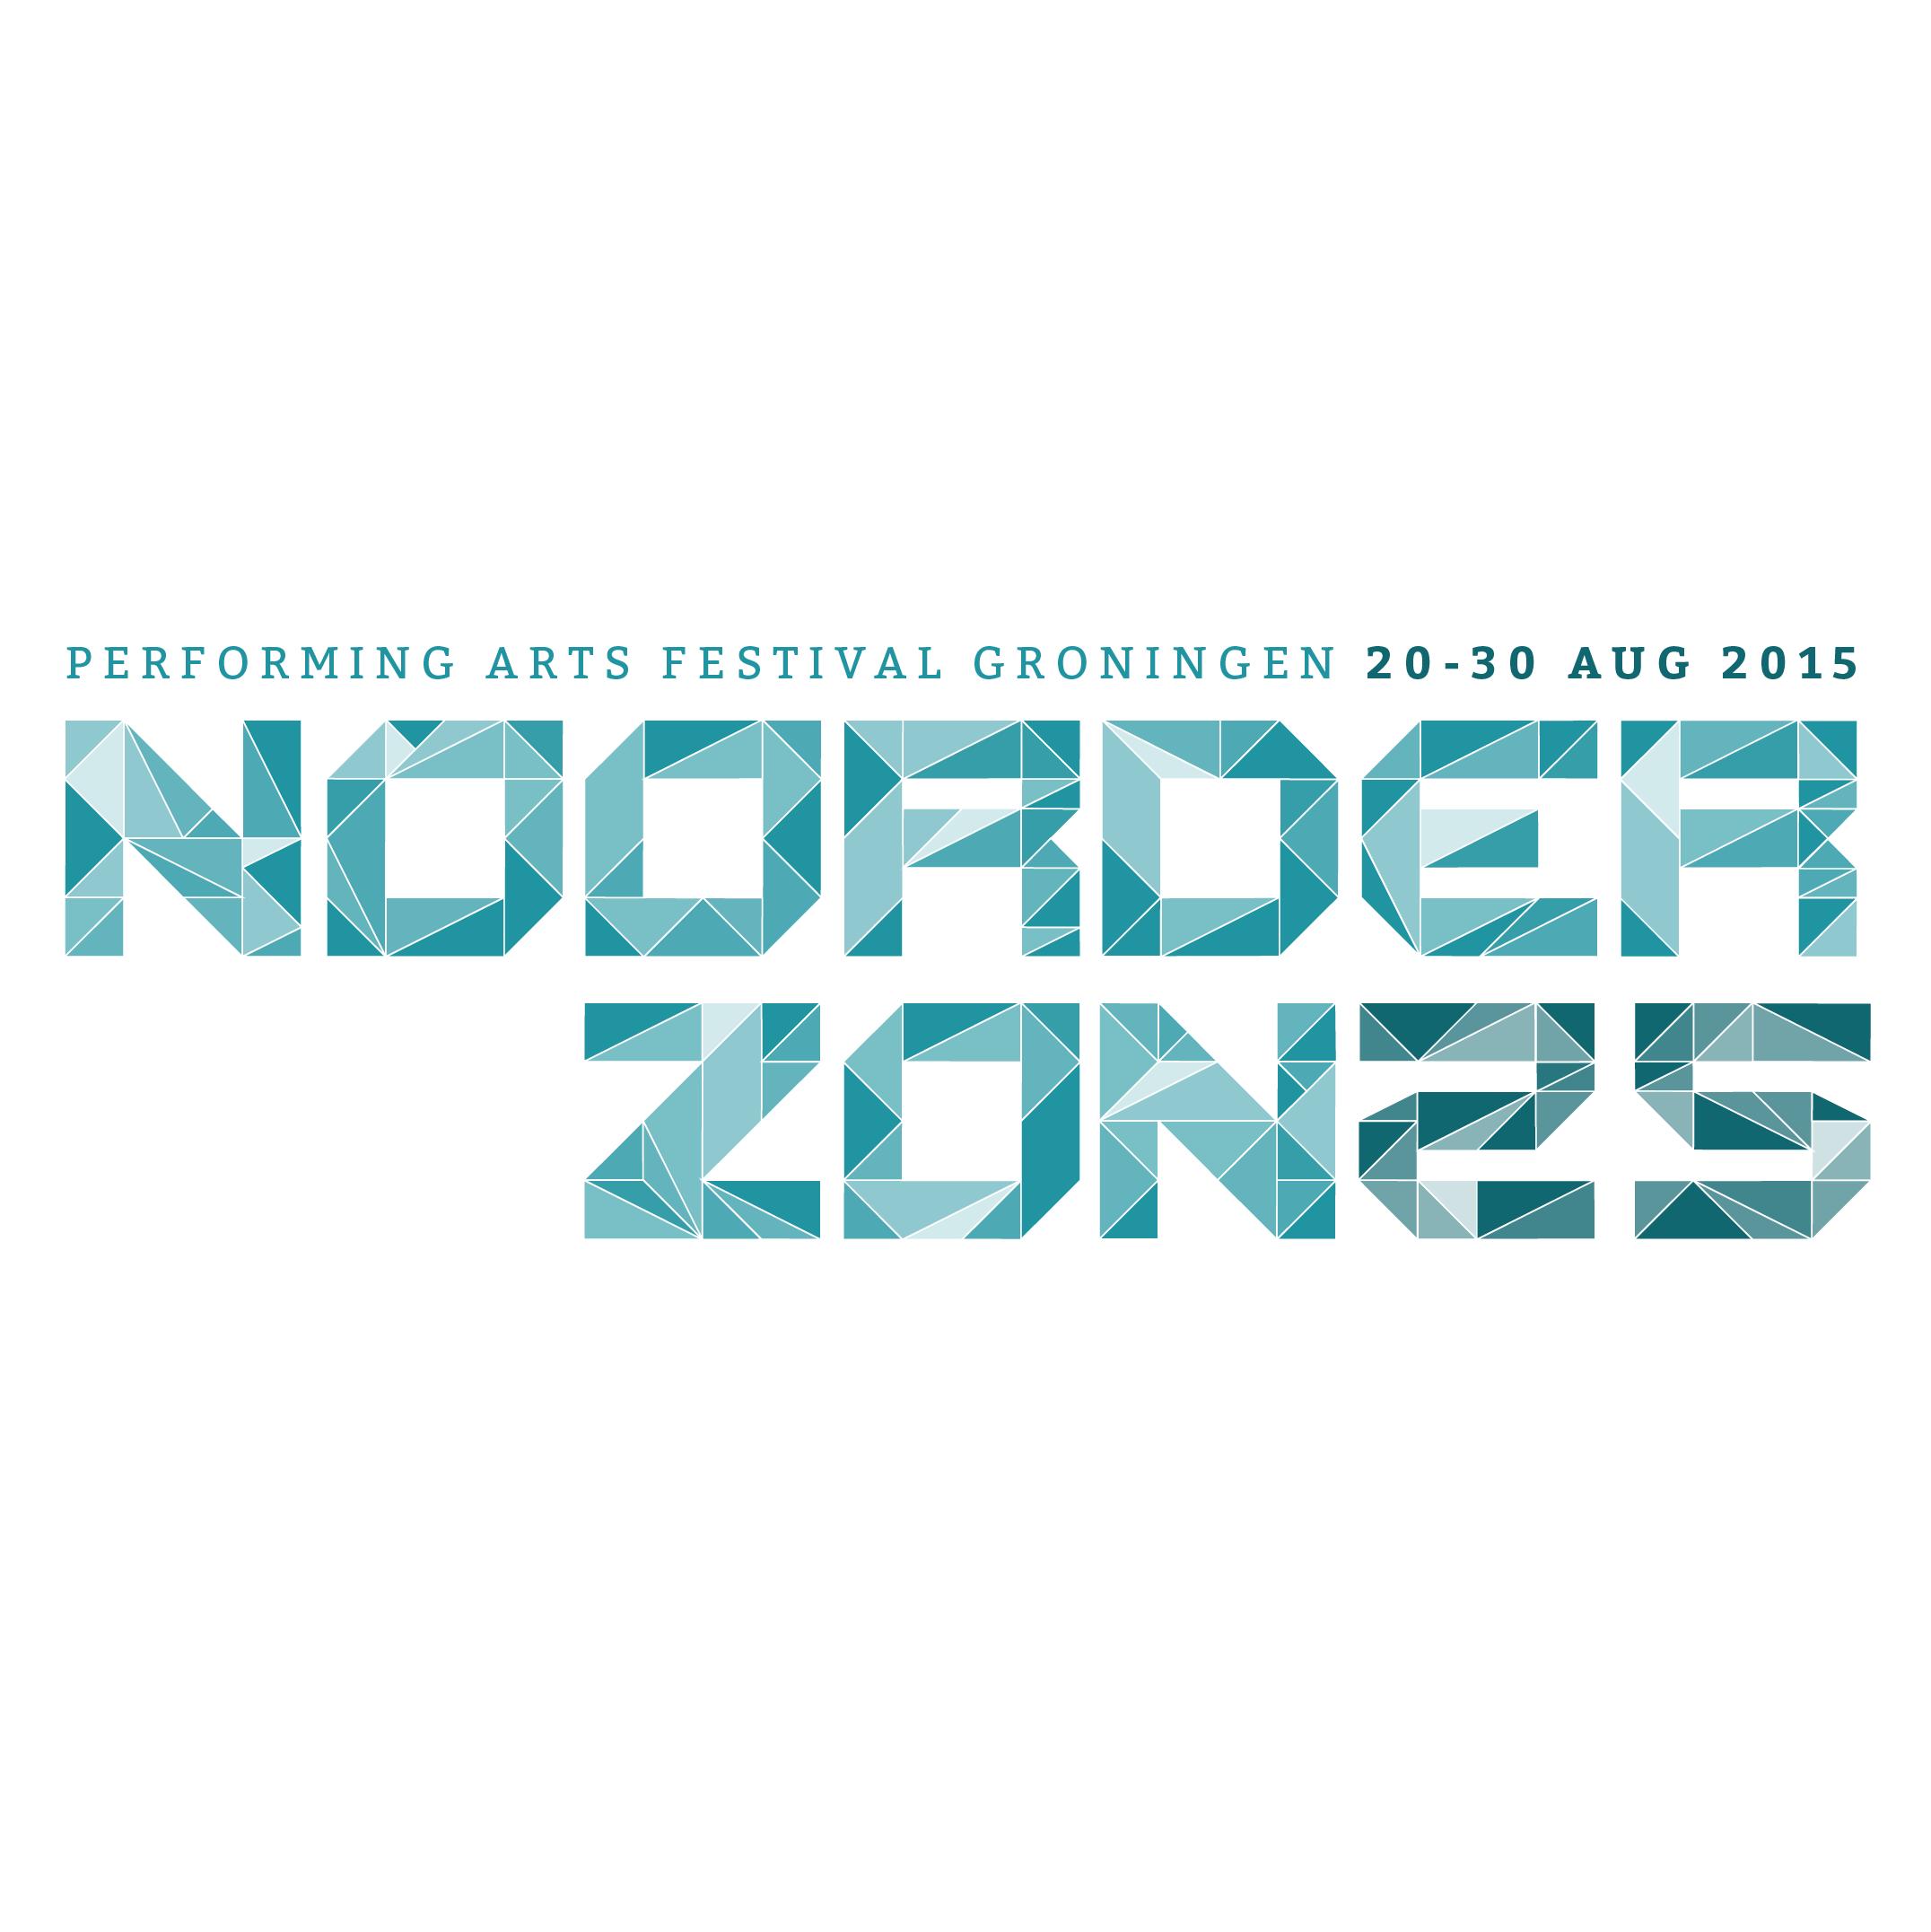 Logo Noorderzon 2015